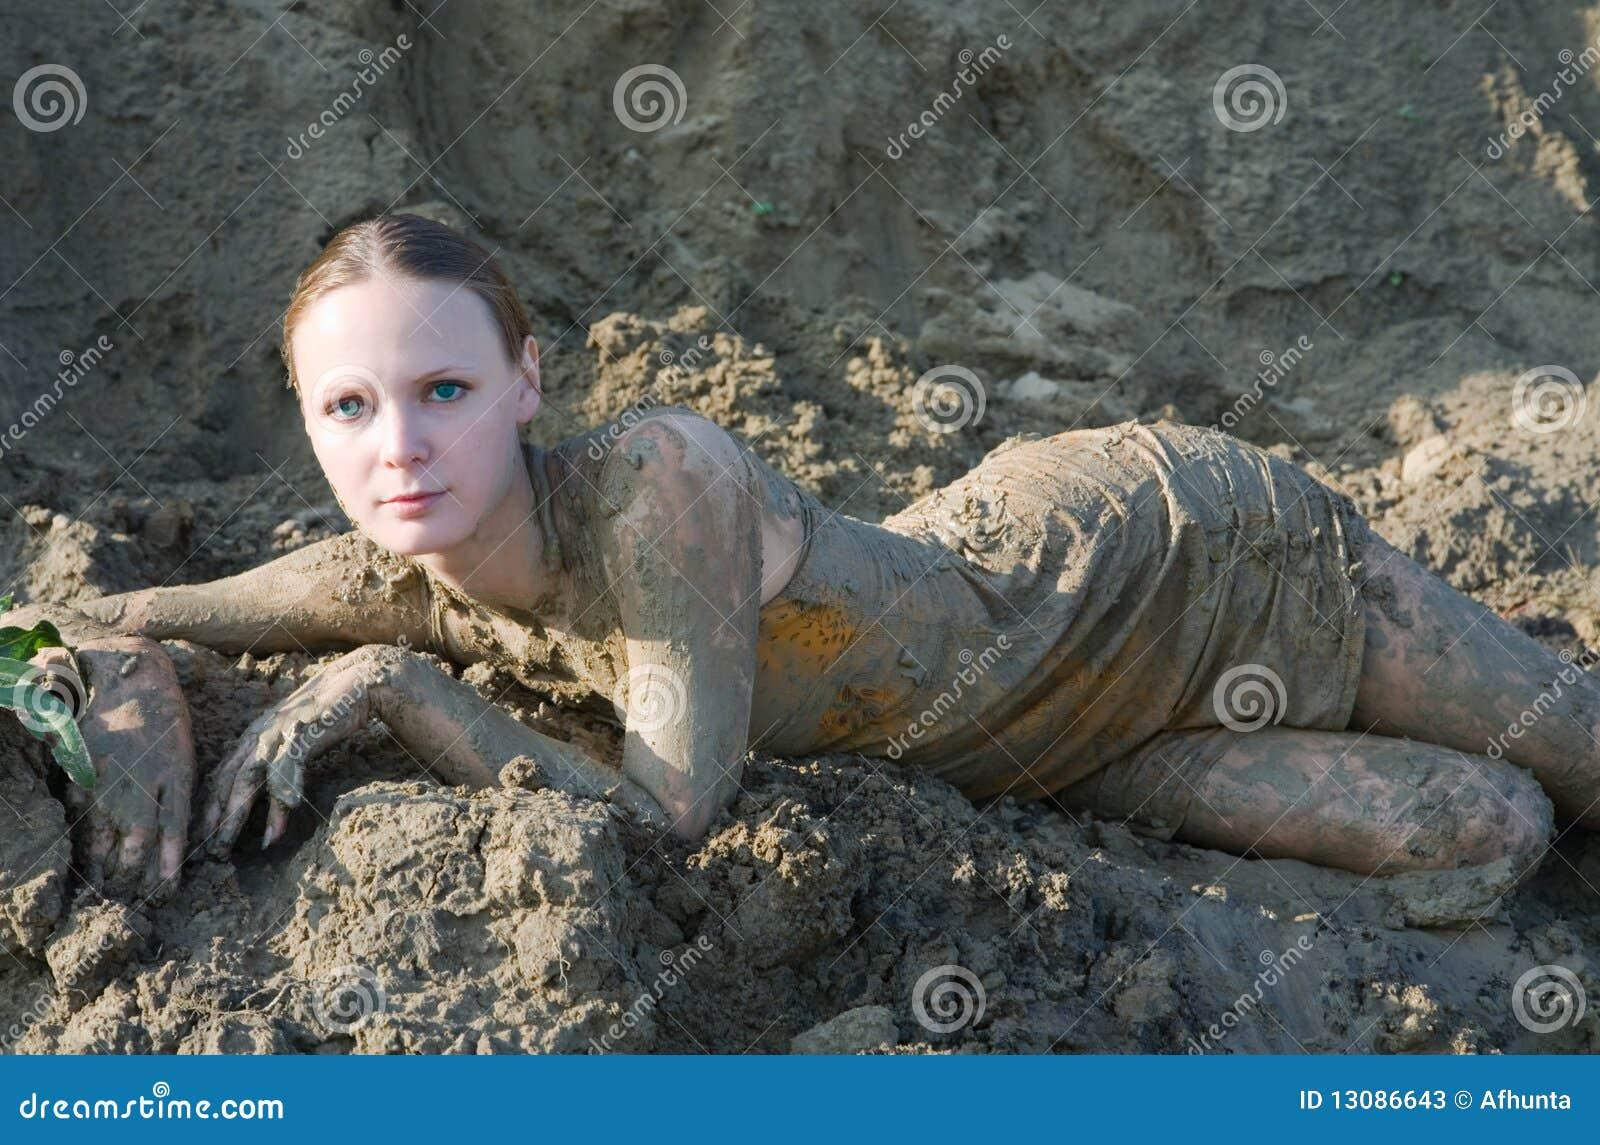 Фото девушек в грязи 23 фотография